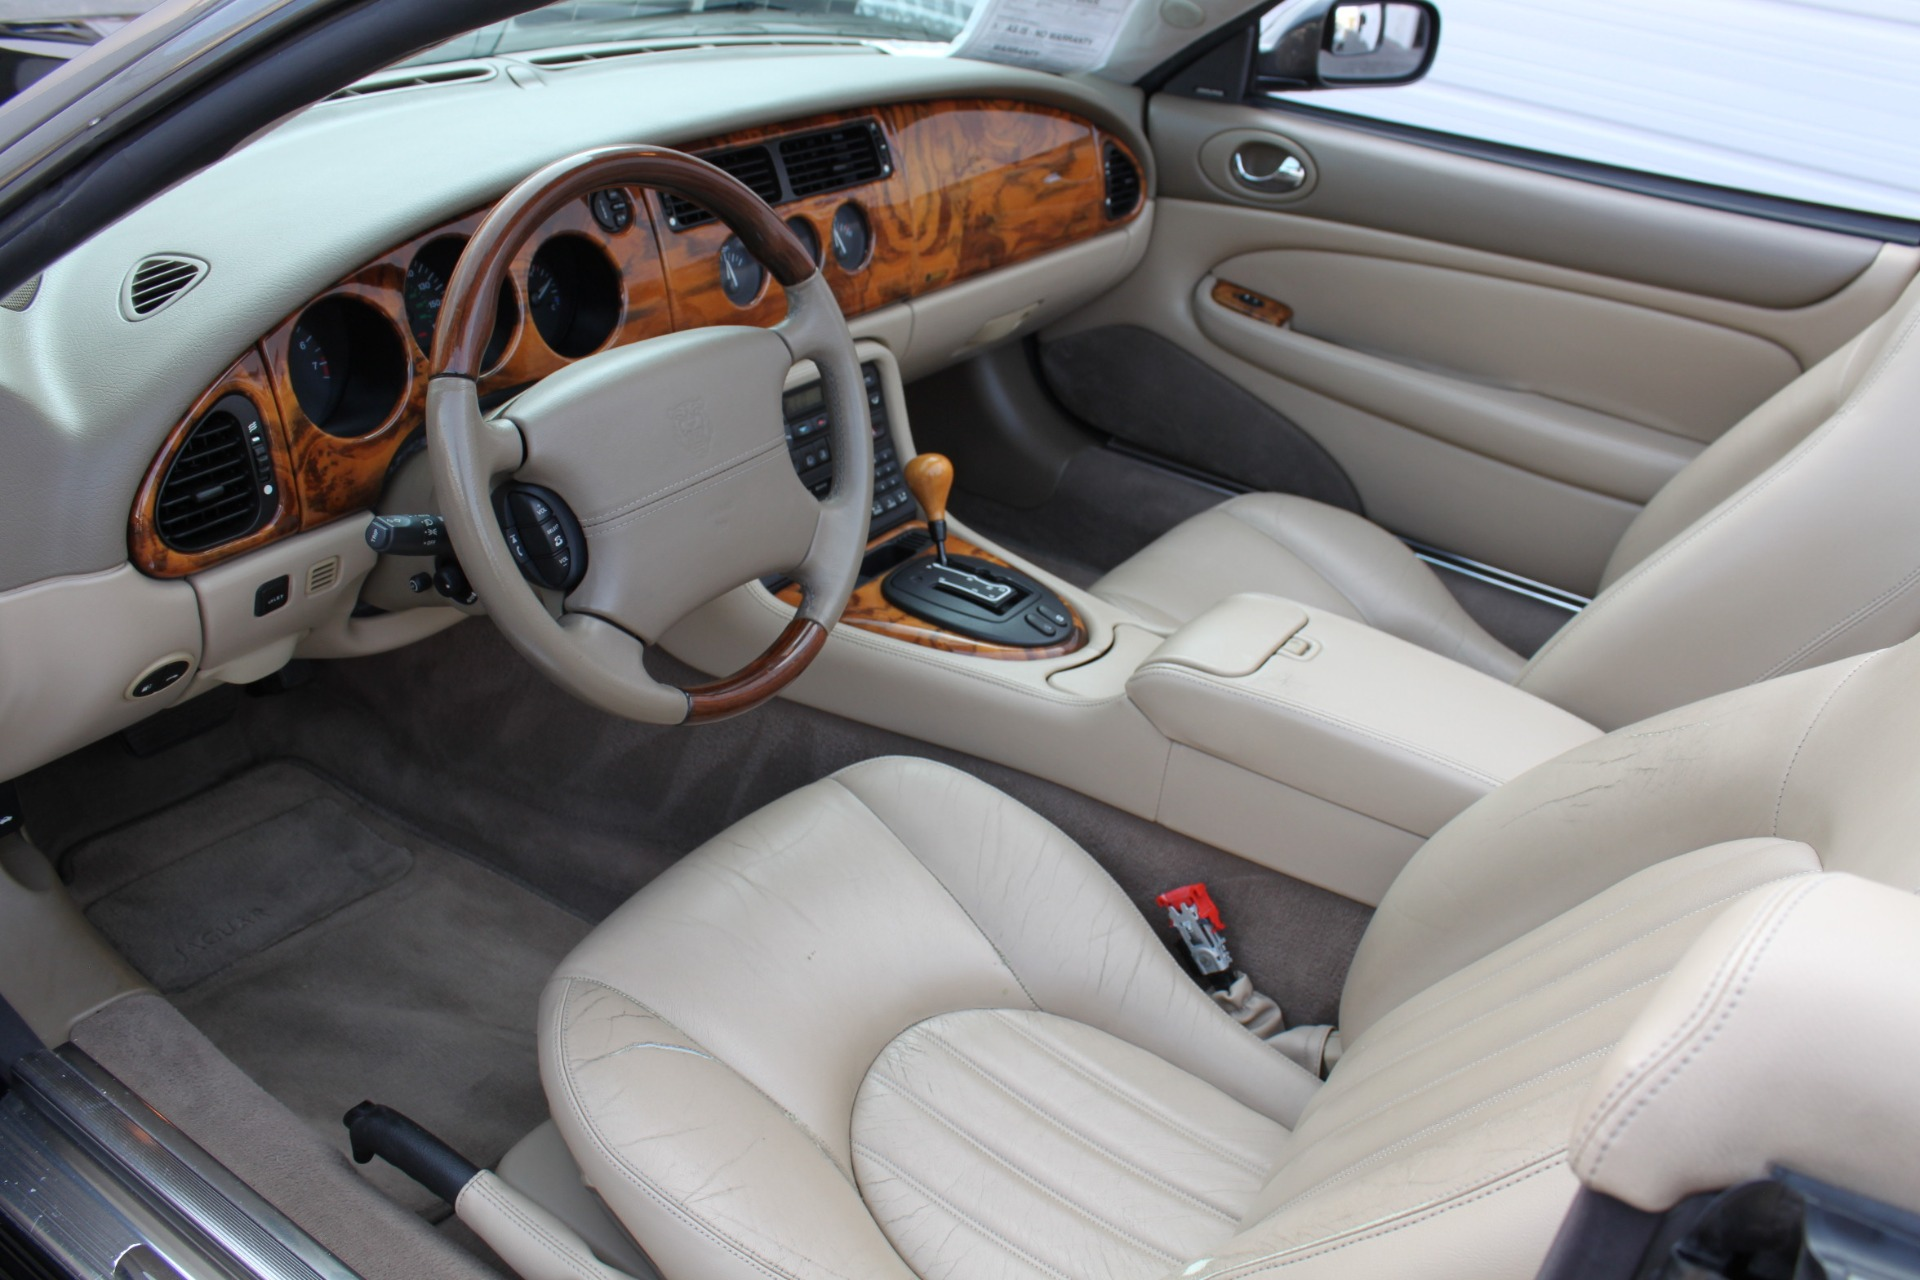 Used-2002-Jaguar-XK8-Convertible-XK8-vintage